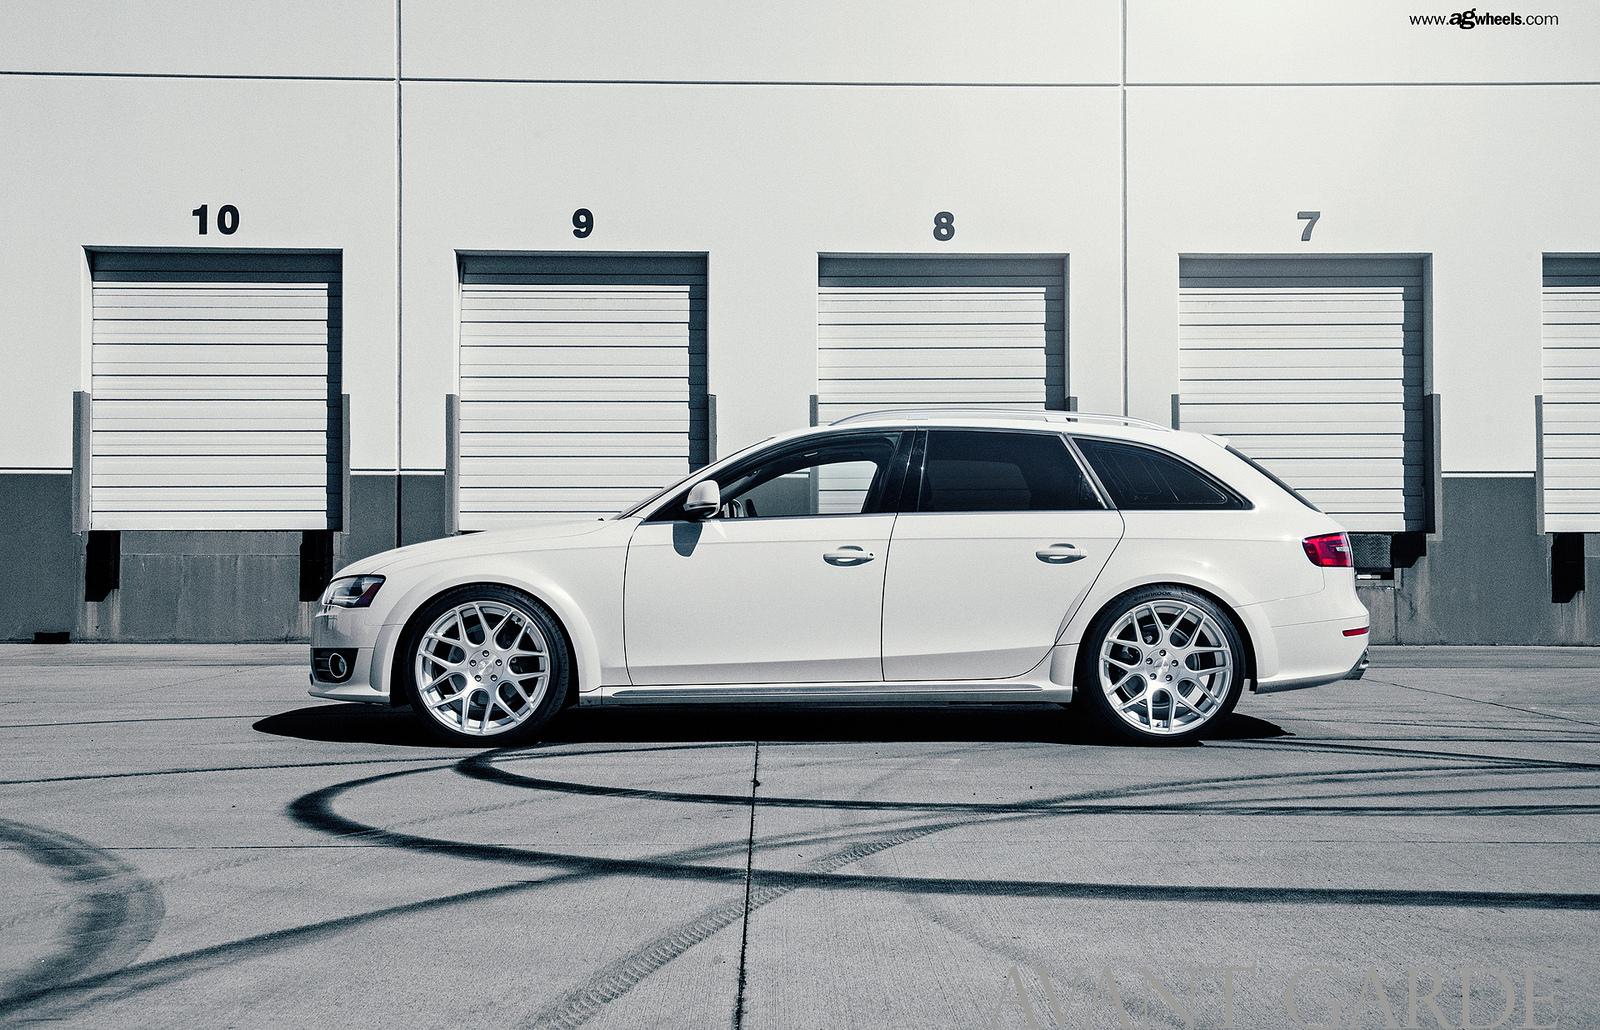 2001 Audi Allroad Standard Model Tires - tiresize.com